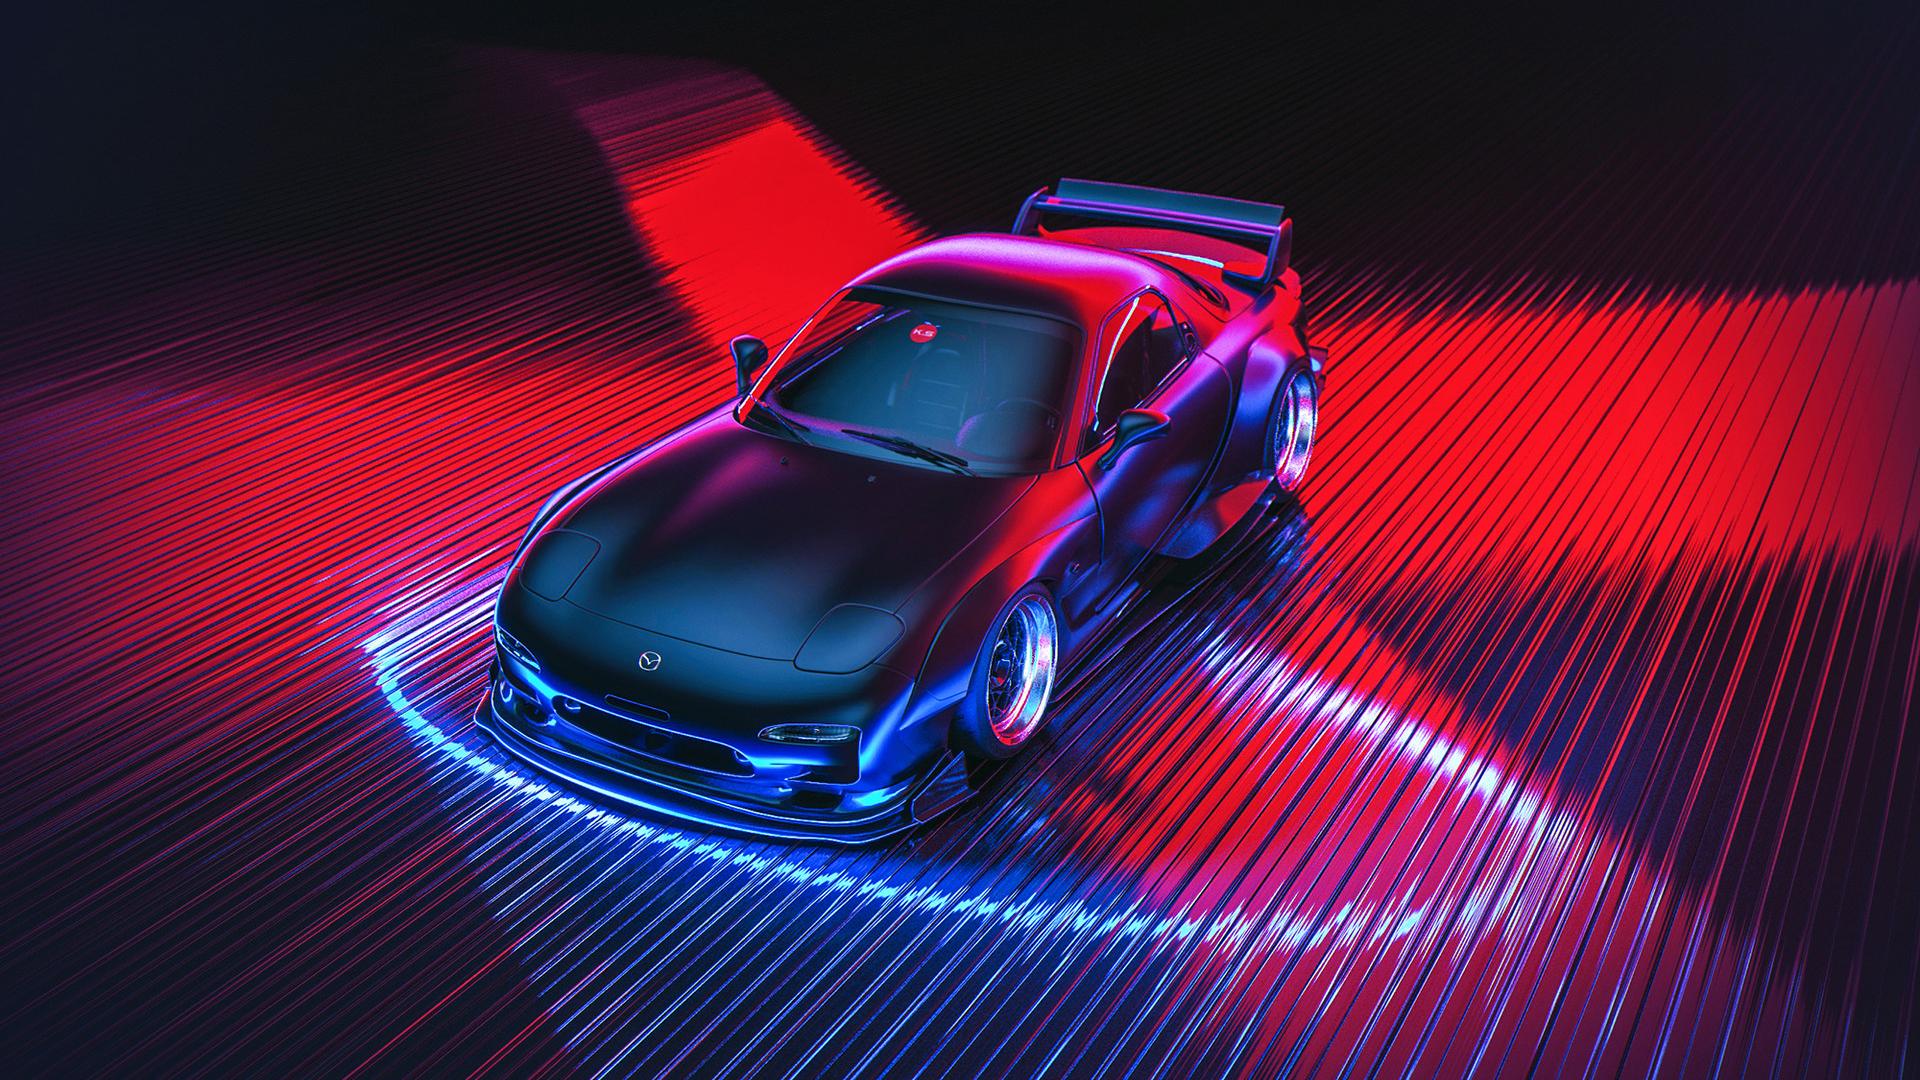 3d Car Wallpaper Apk Mazda Neon Car Wallpapers Wallpapers Hd